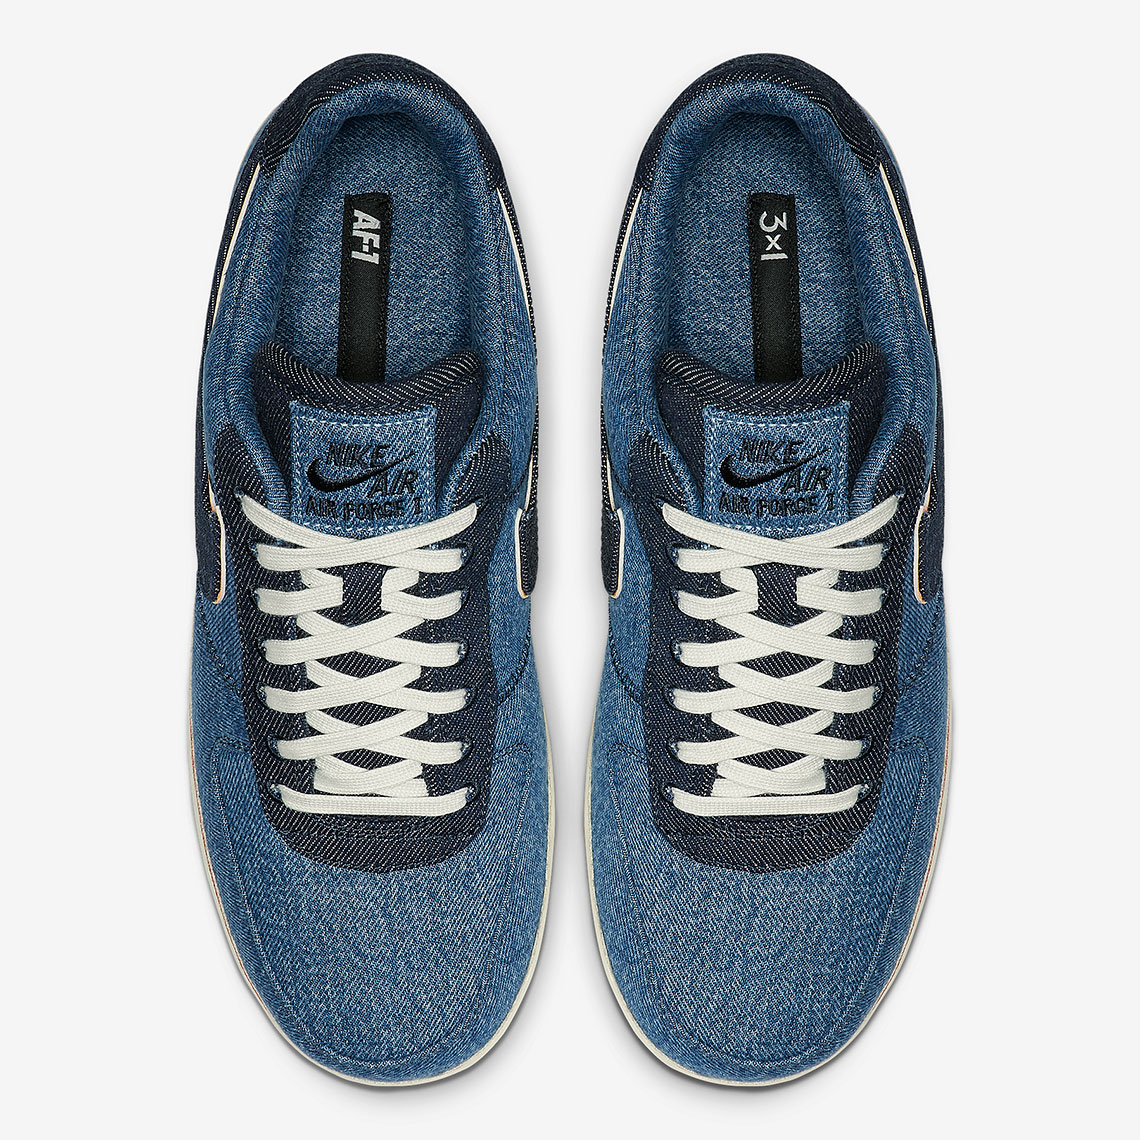 3x1 Nike Air Force 1 Selvedge Denim 905345 006 Release Info